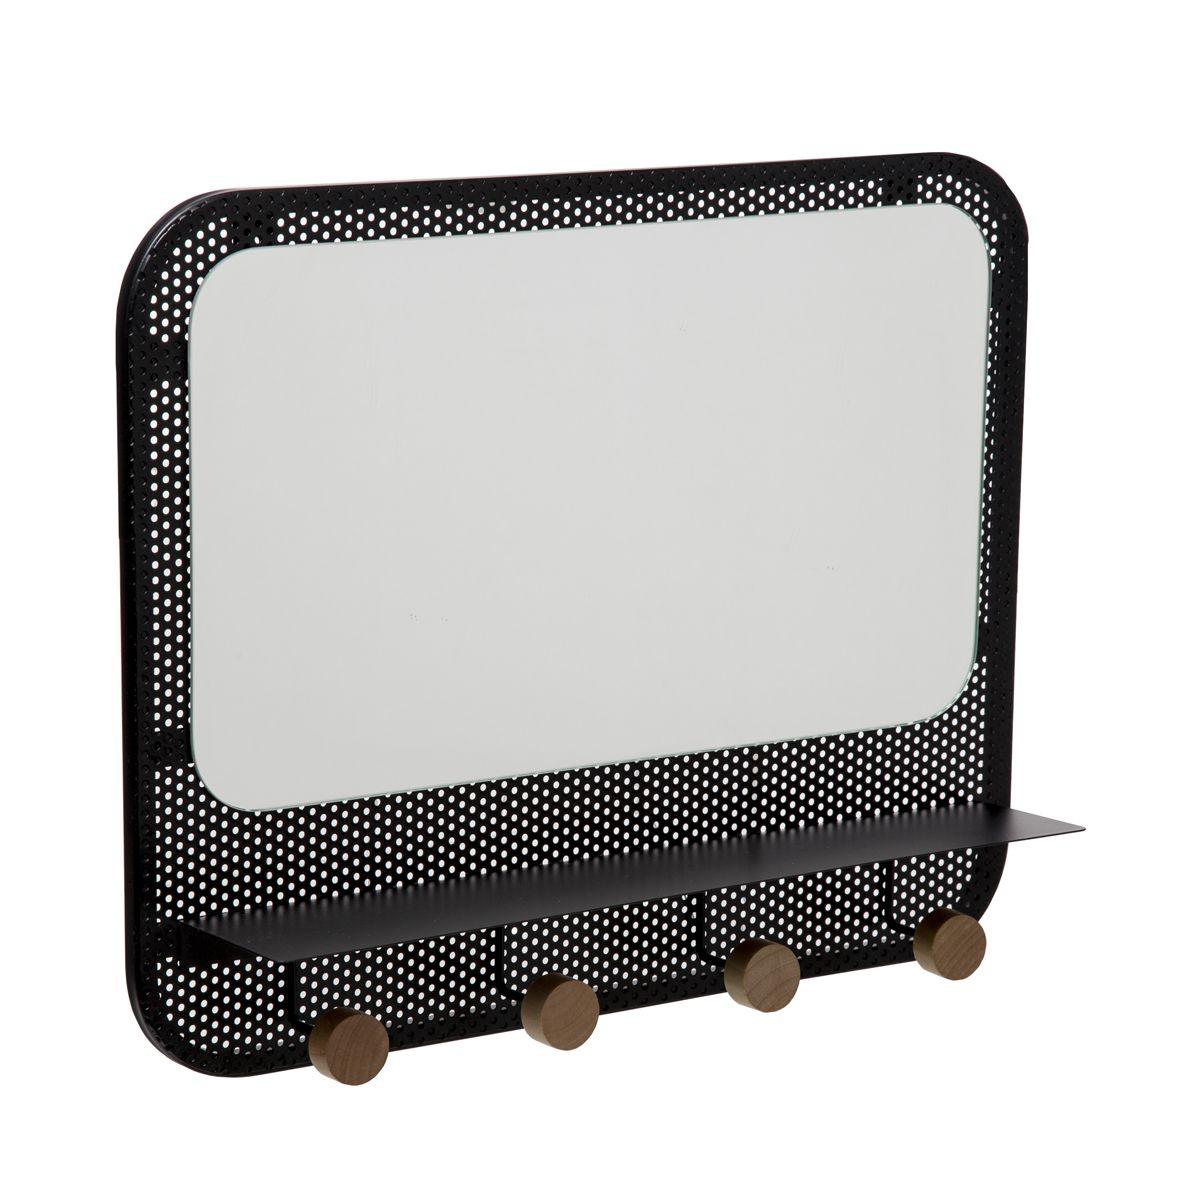 Miroir patère en métal noir